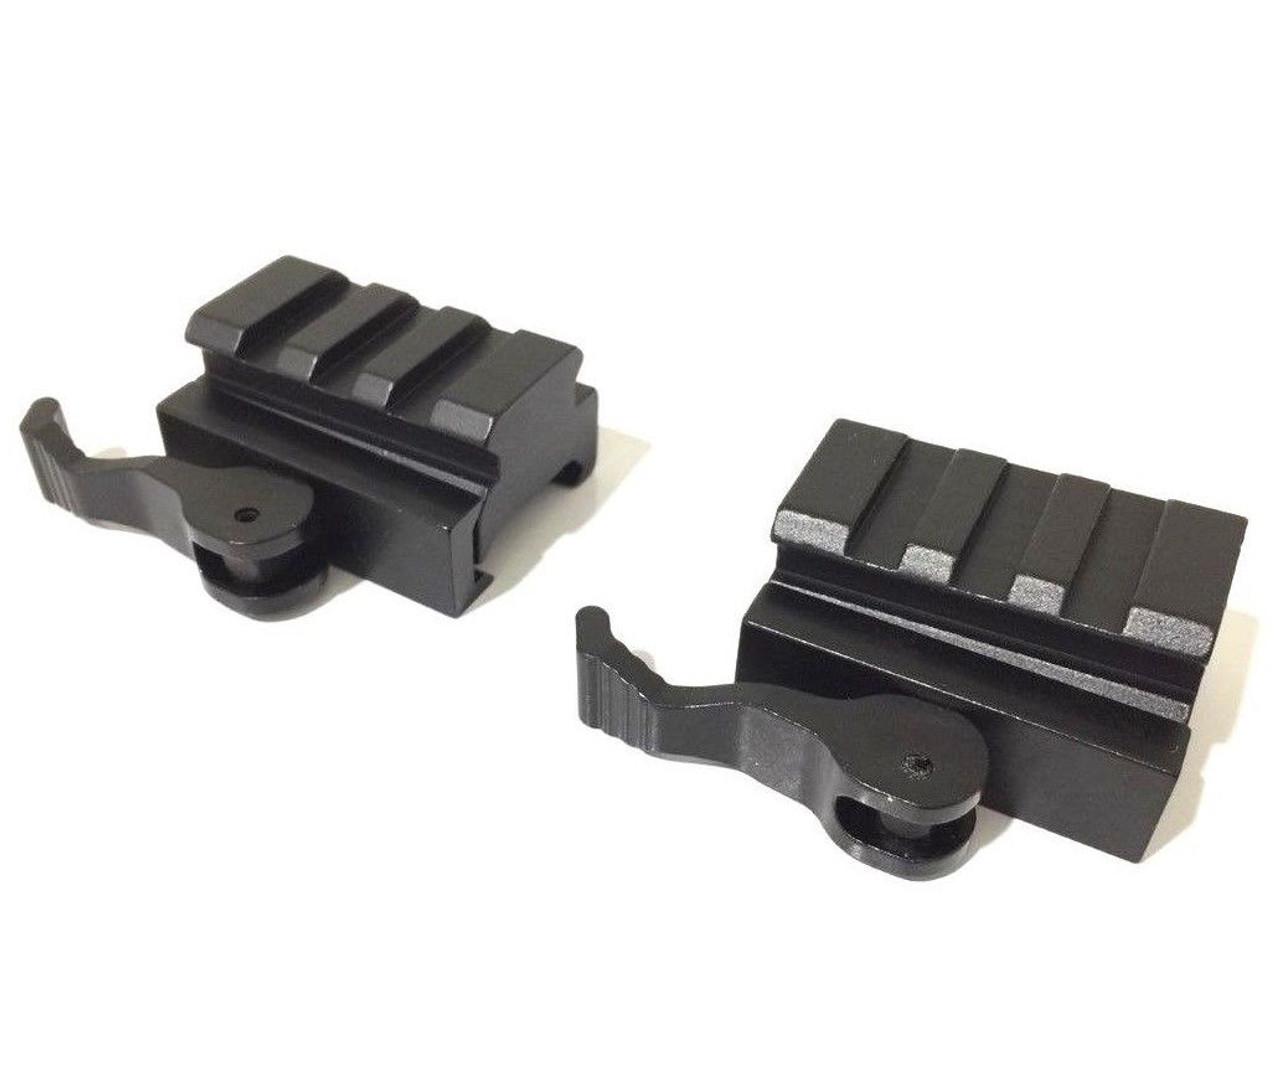 Medium 3 Slots Riser Sight Rifle Scope QD 20mm Picatinny Rail Sturdy Riser Mount